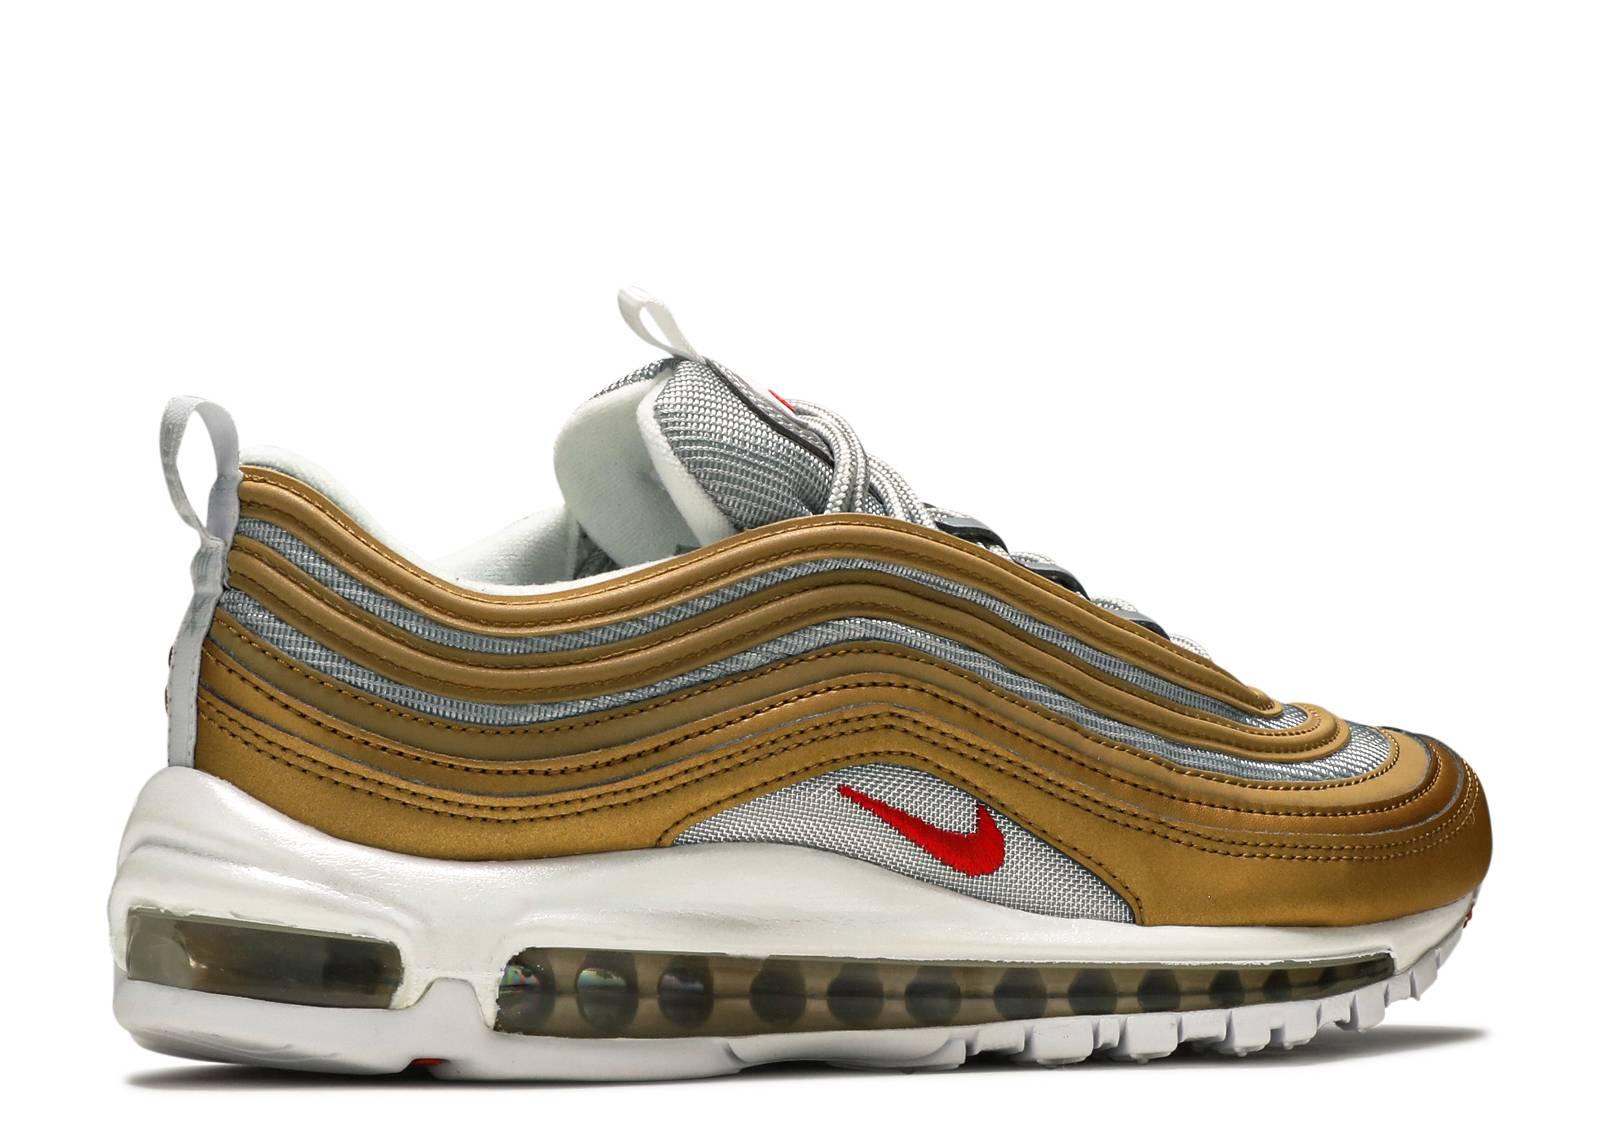 Nike AIR MAX 97 SSL BV0306 700